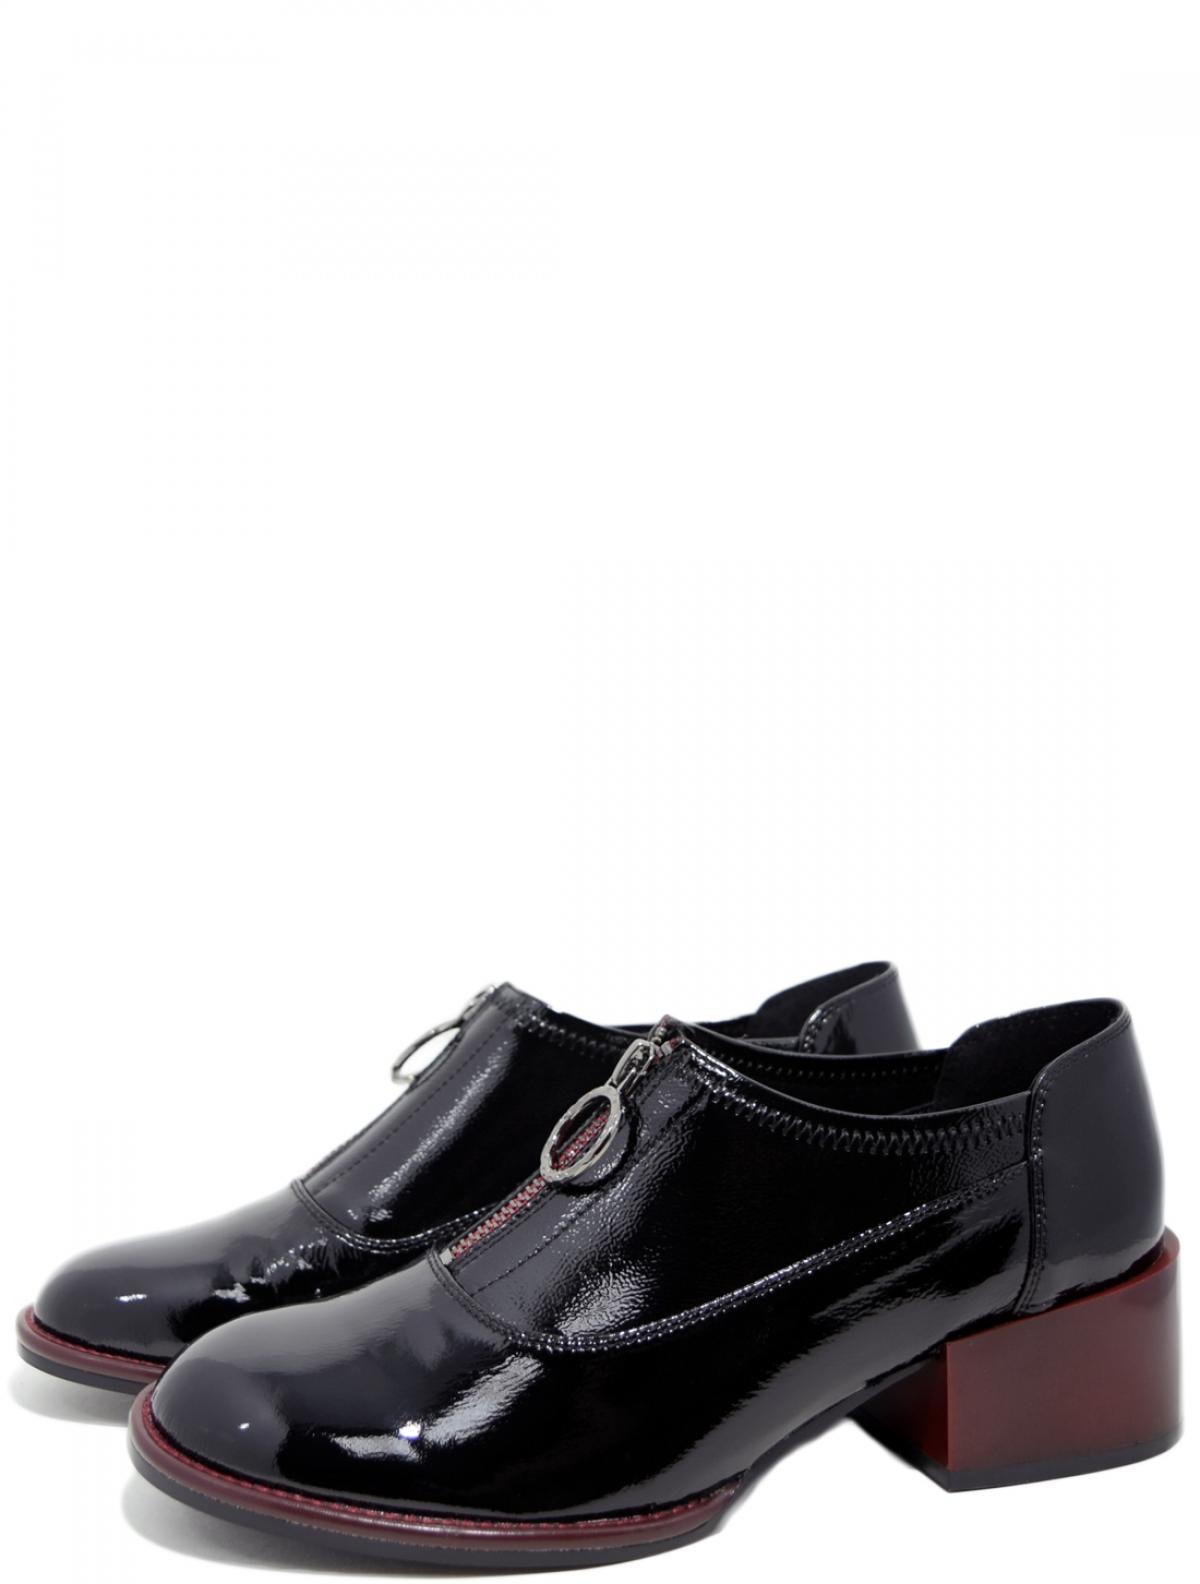 Respect IS74-126097 женские туфли